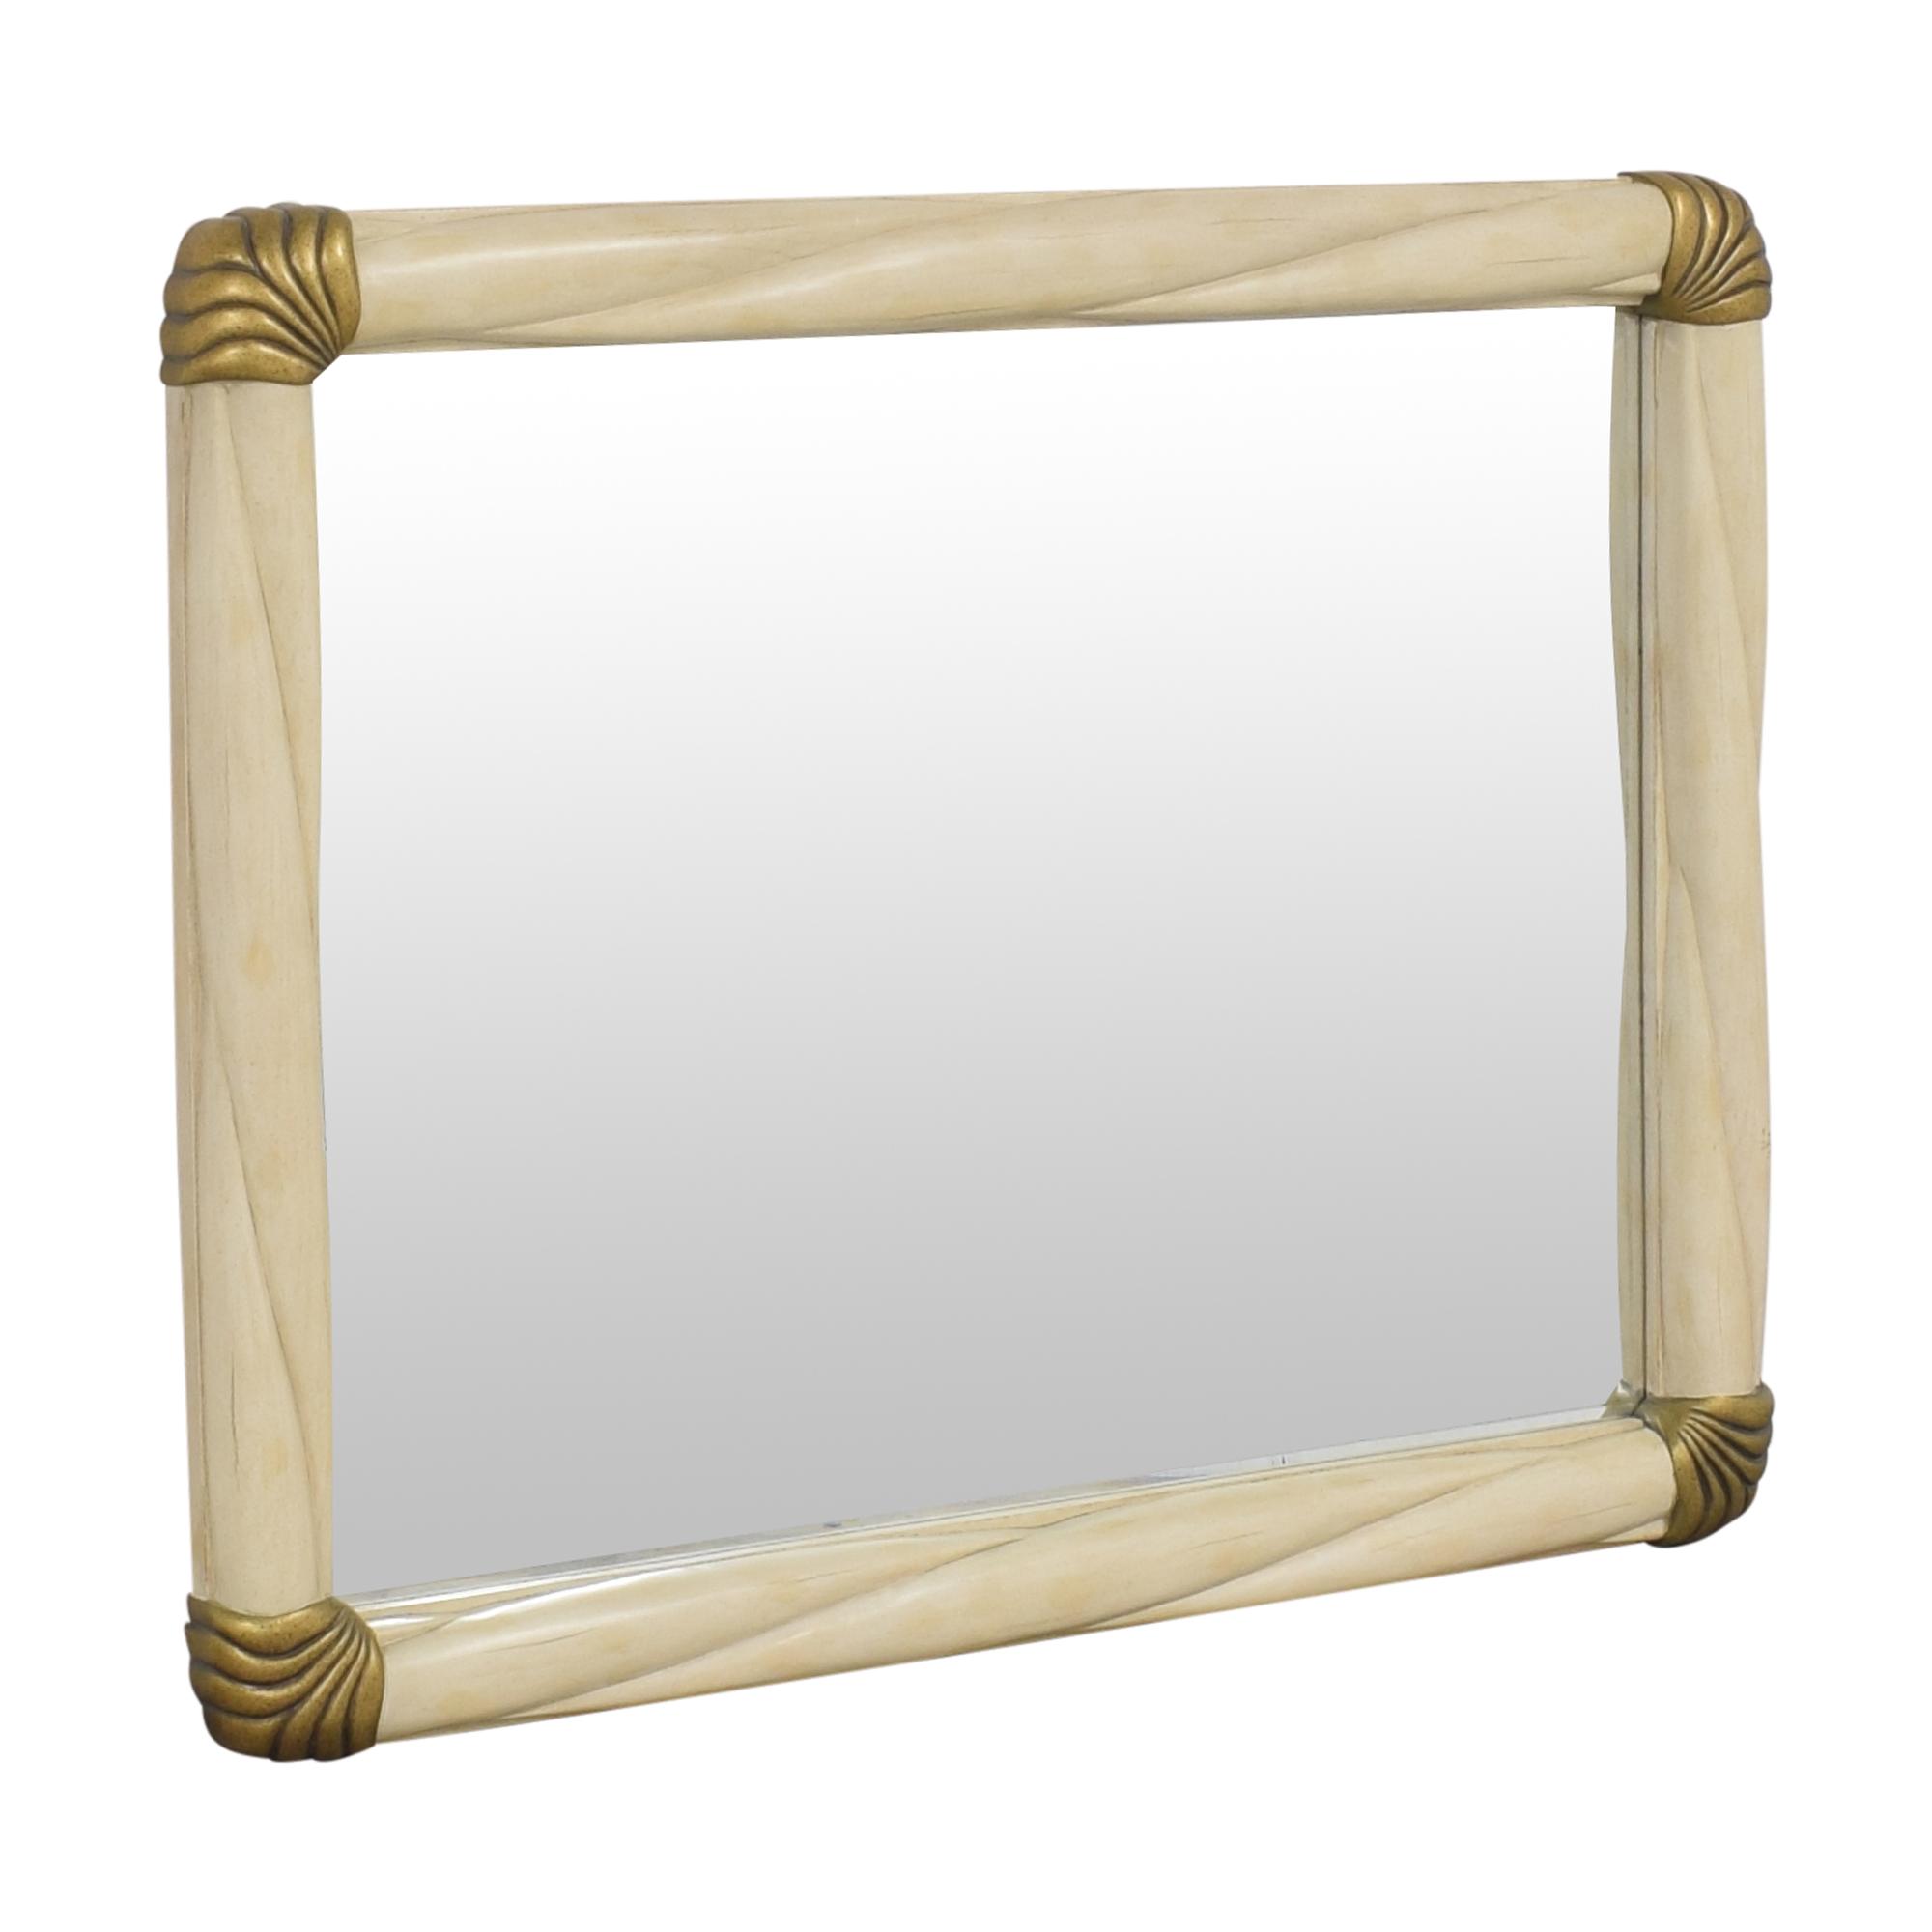 Bernhardt Framed Wall Mirror sale